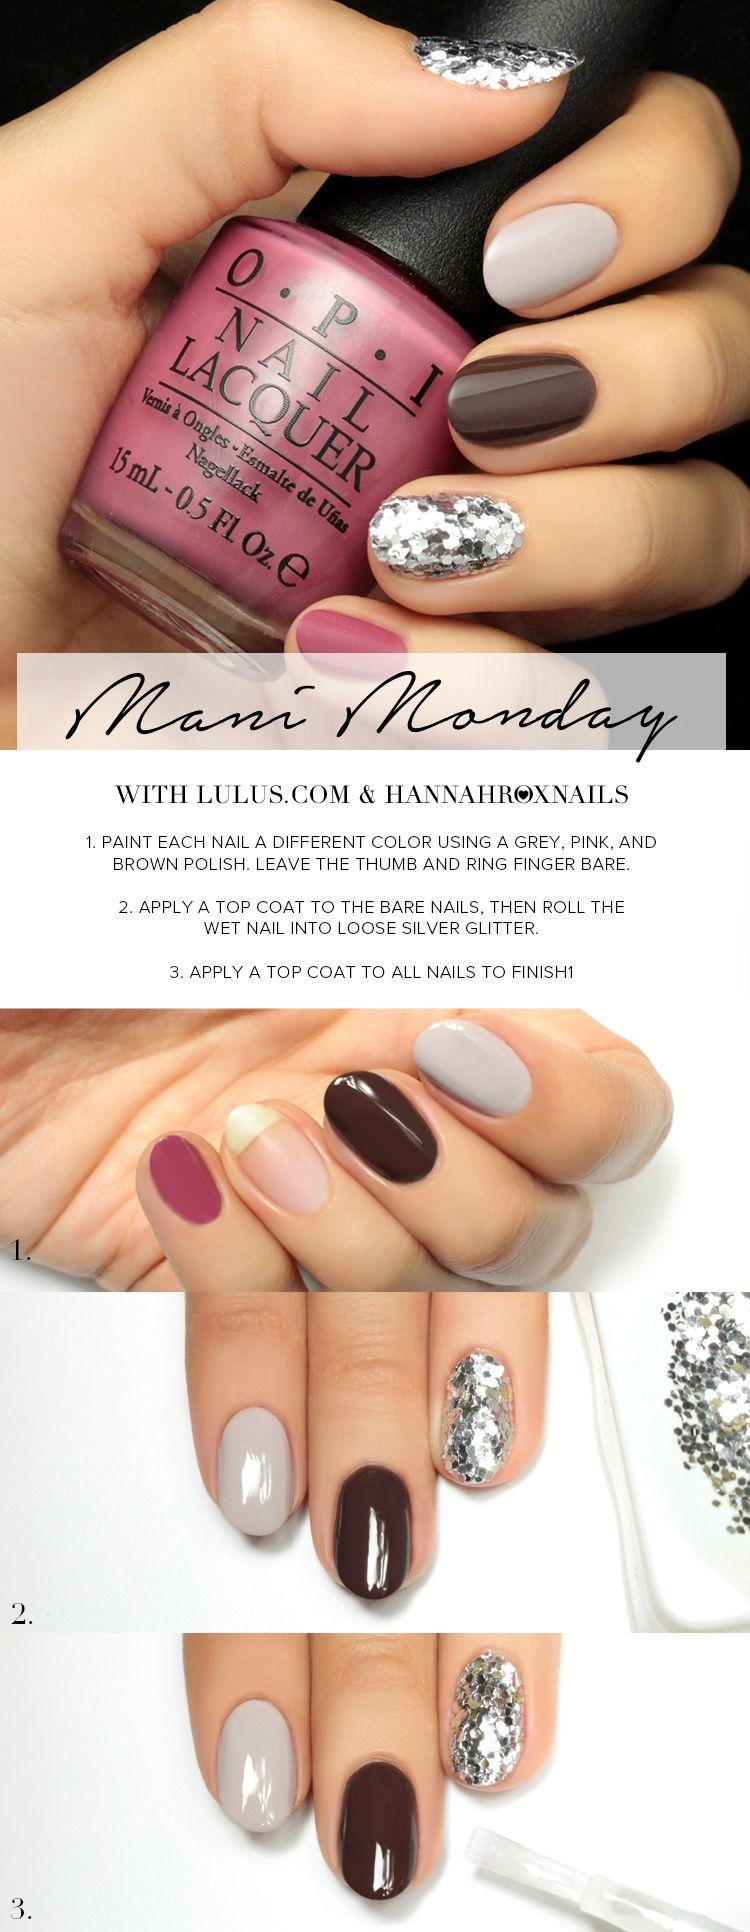 Mani Monday: Fall Sequin Nail Tutorial | Sequins, Mondays and Tutorials